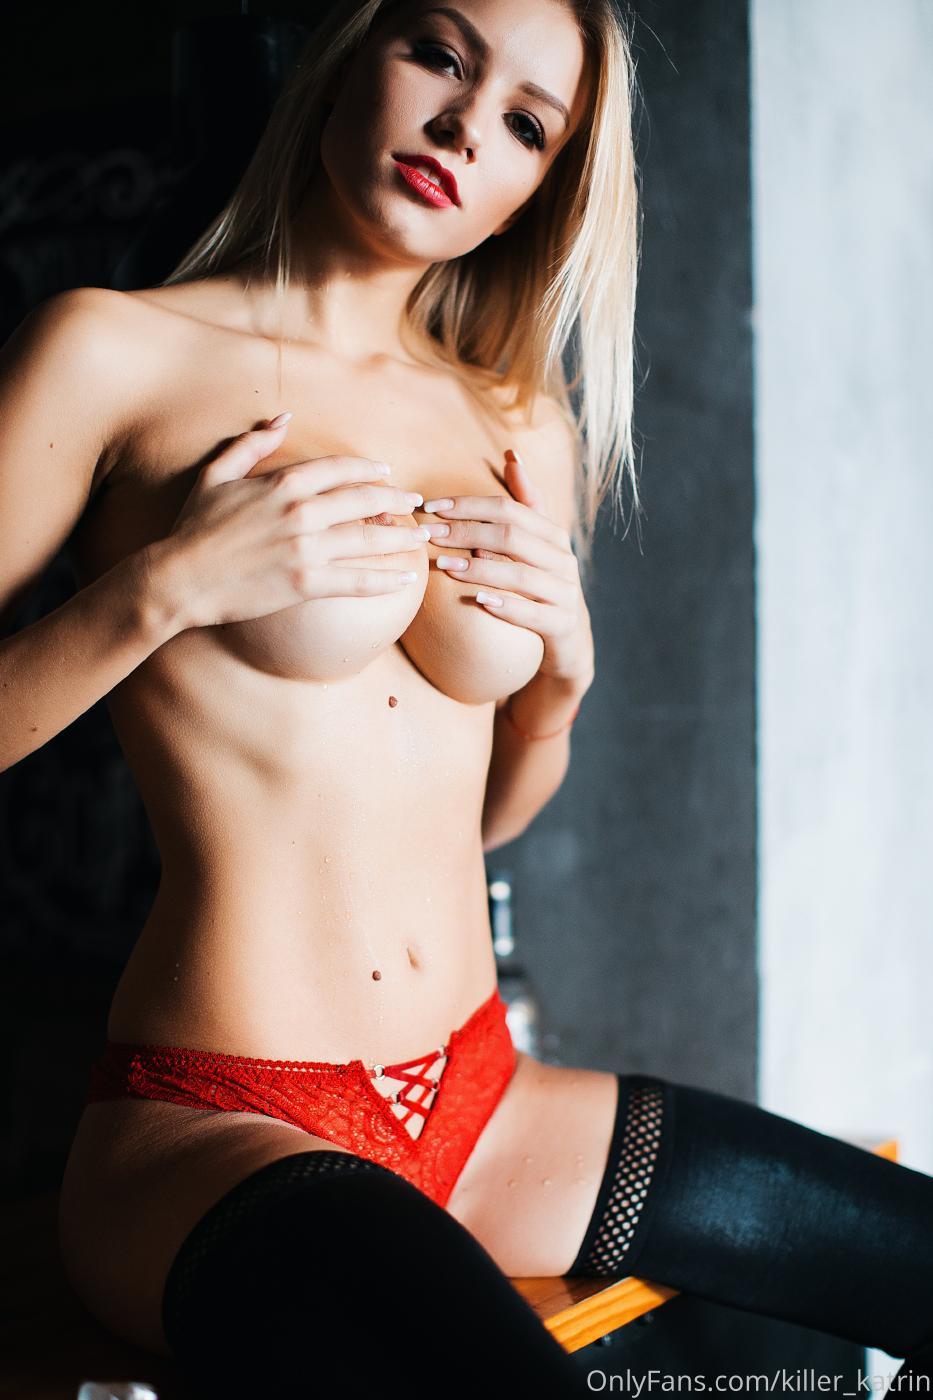 Killer Katrin Topless Bar Strip Onlyfans Set Leaked Sjbqqd